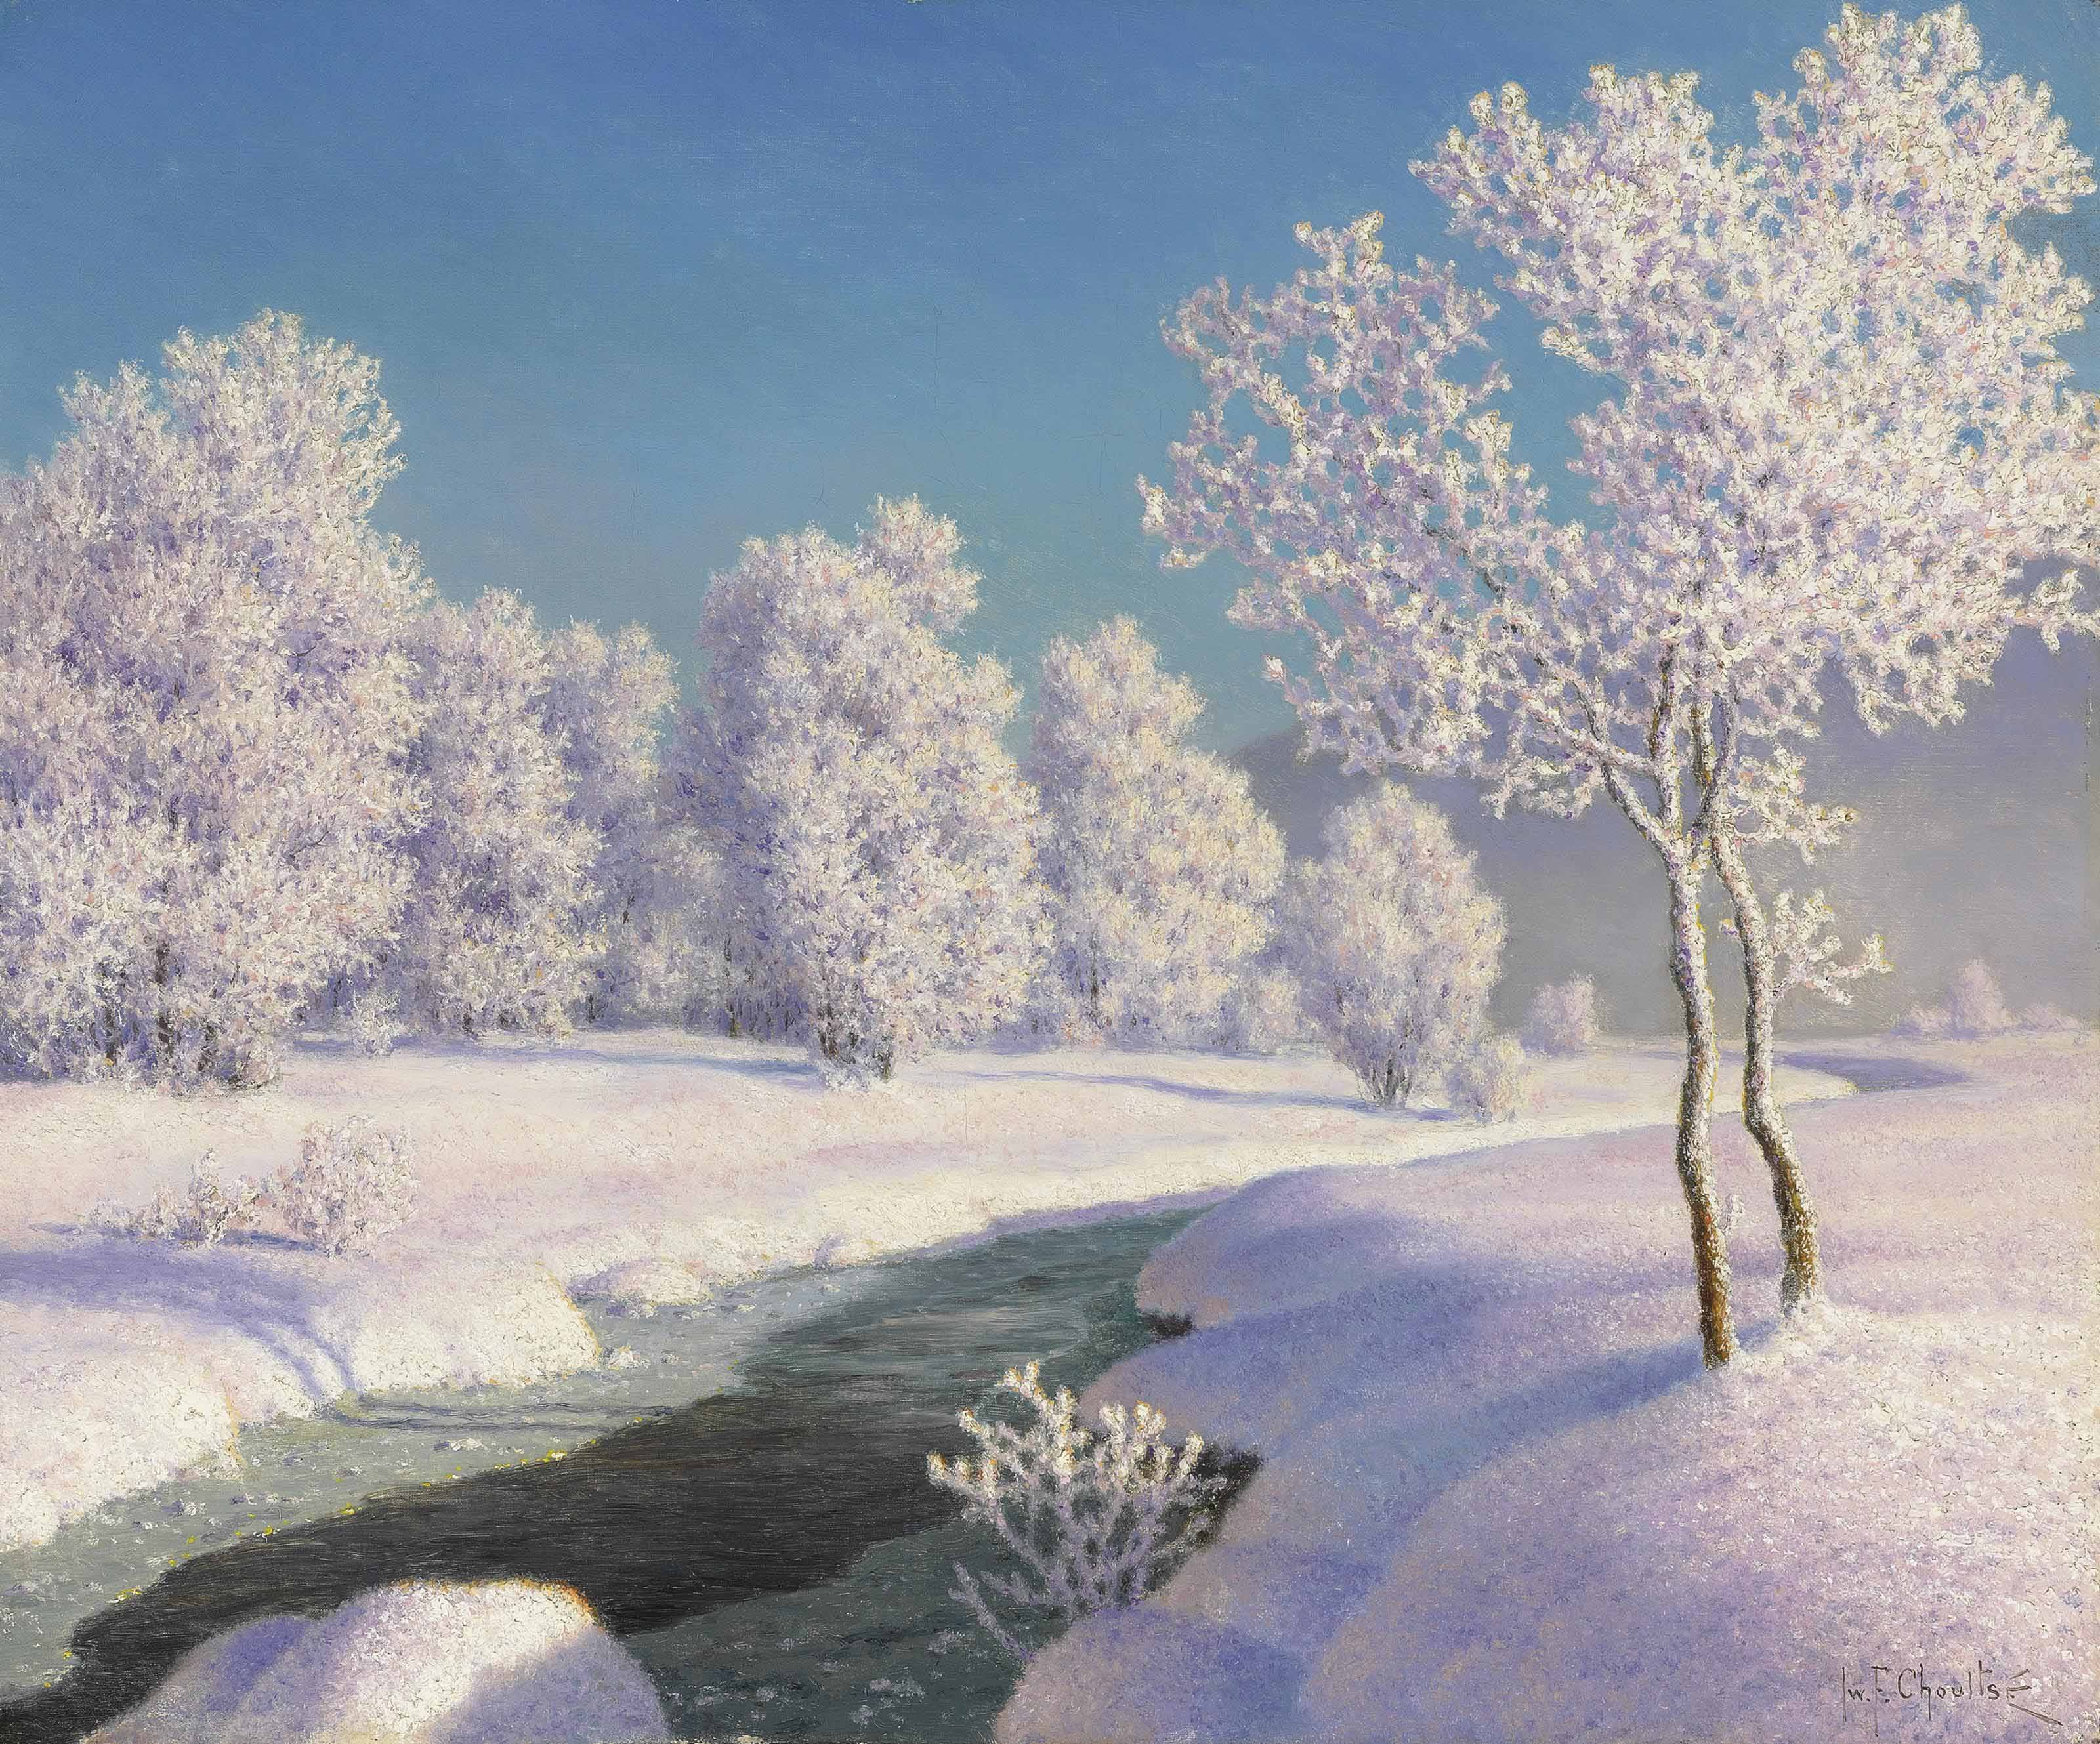 Winter morning in Engadine